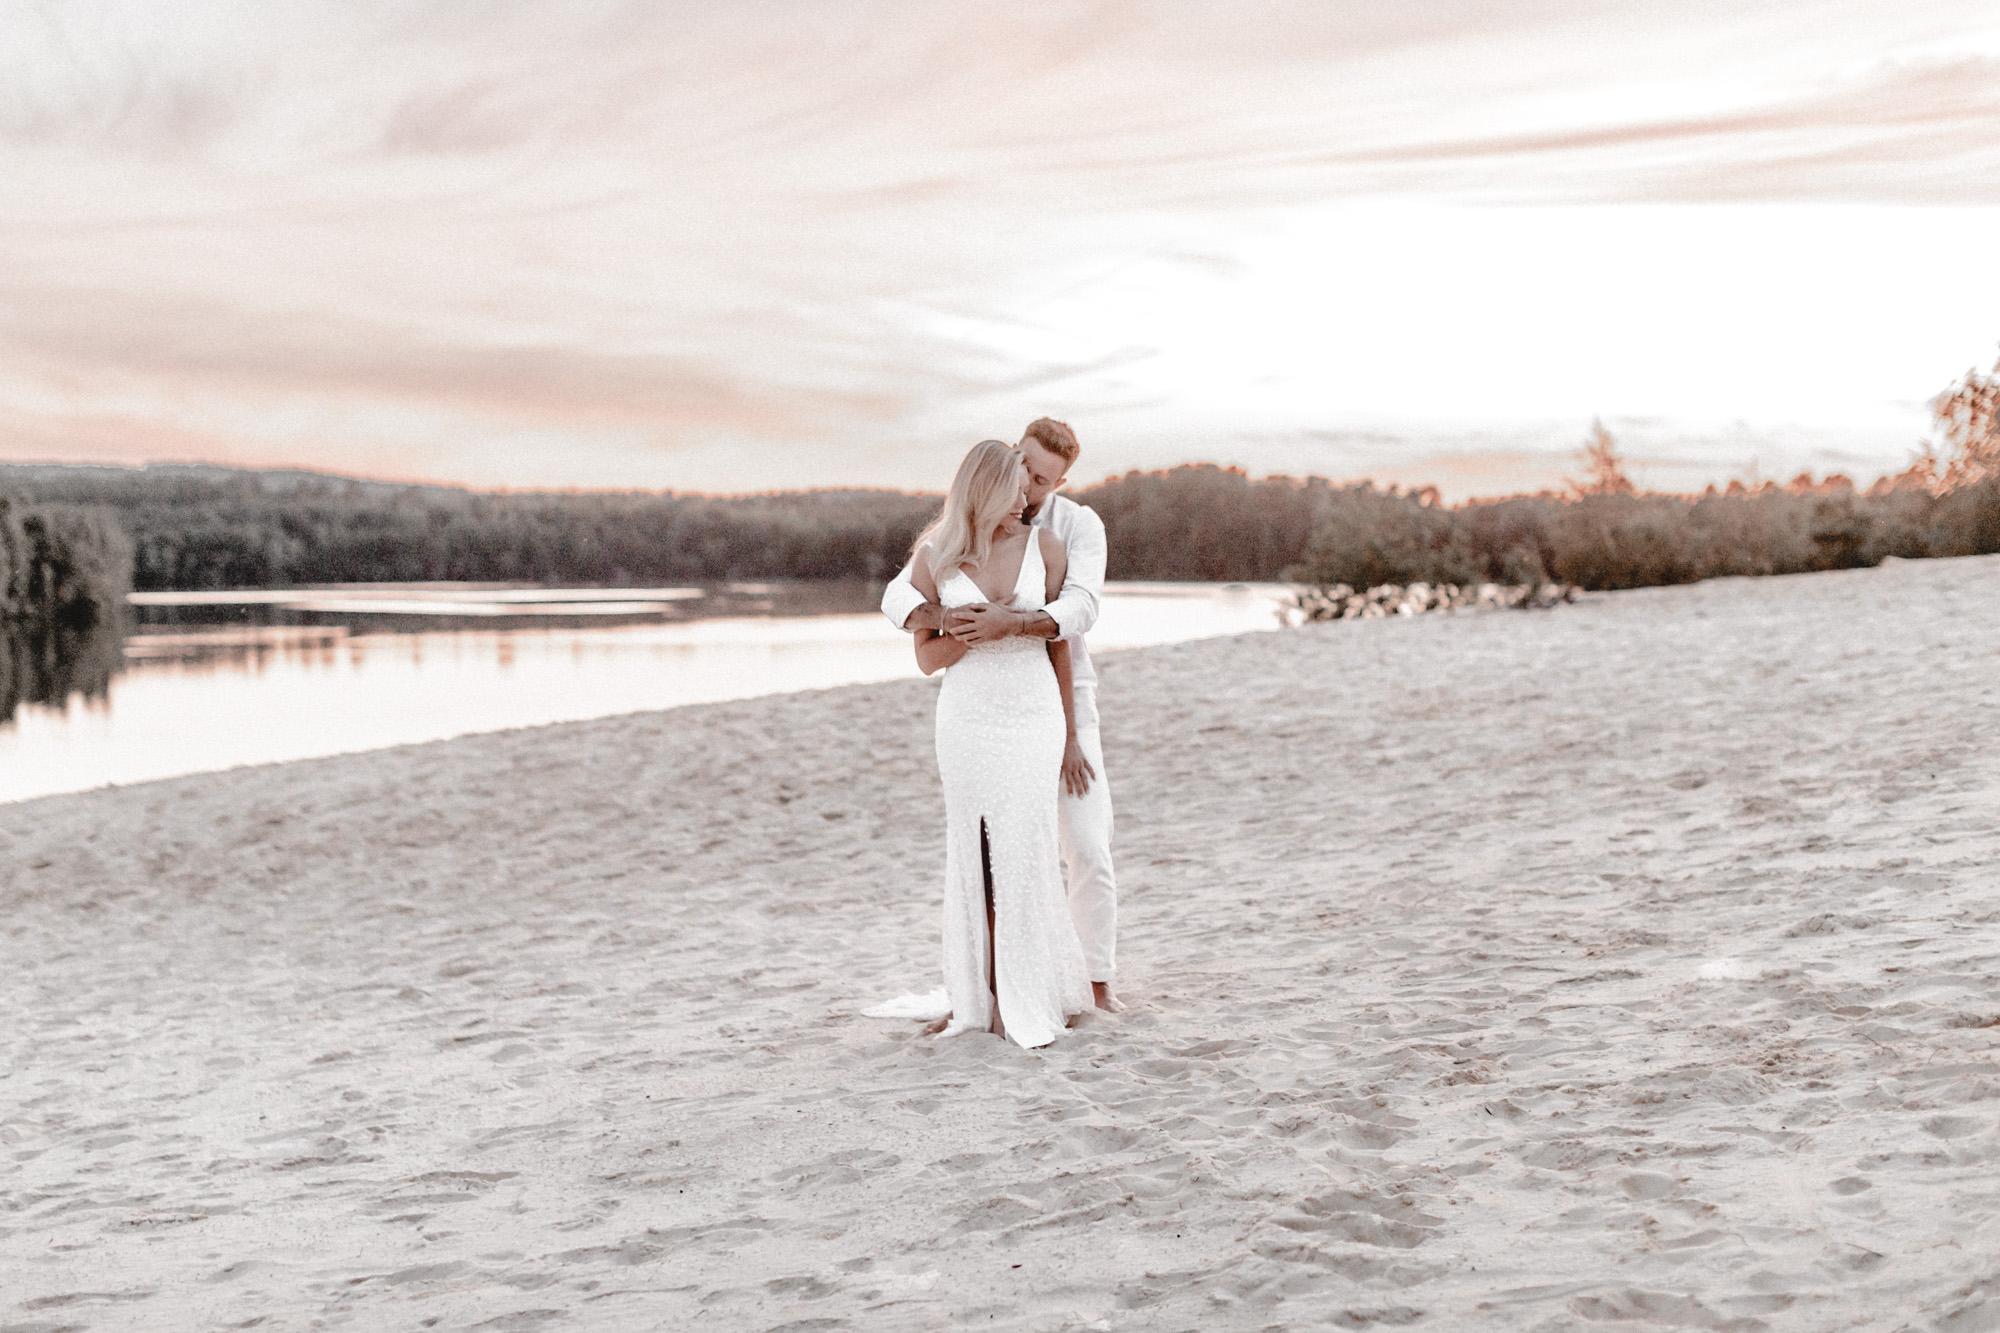 wedding-photographer-italy-europe-221604